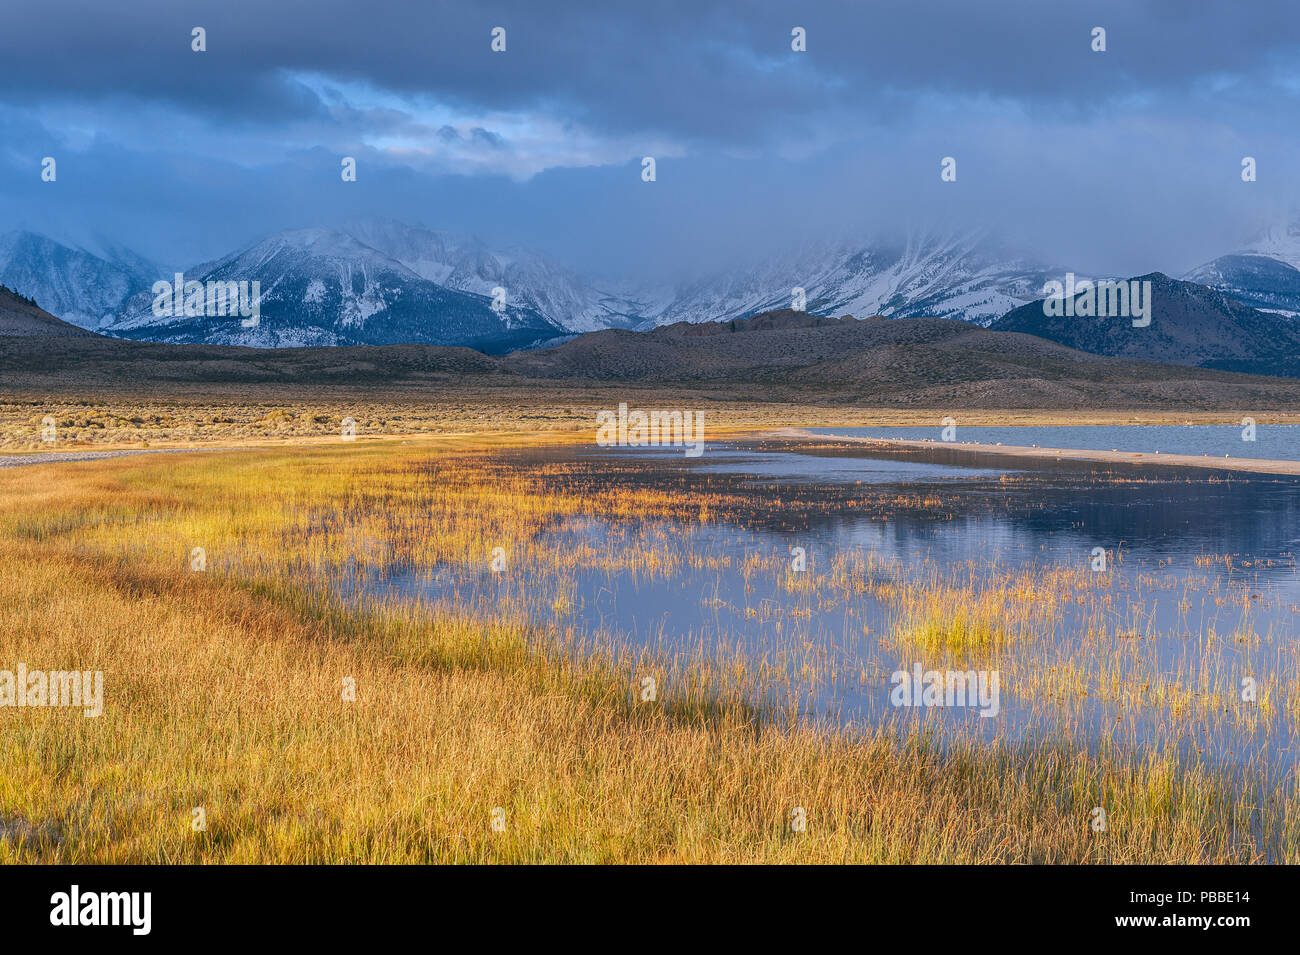 Approaching Storm, Mount Gibbs, Mount Dana, Wetlands, Mono Lake, Mono Basin National Forest Scenic Area, Inyo National Forest, Easternm Sierra, Califo - Stock Image